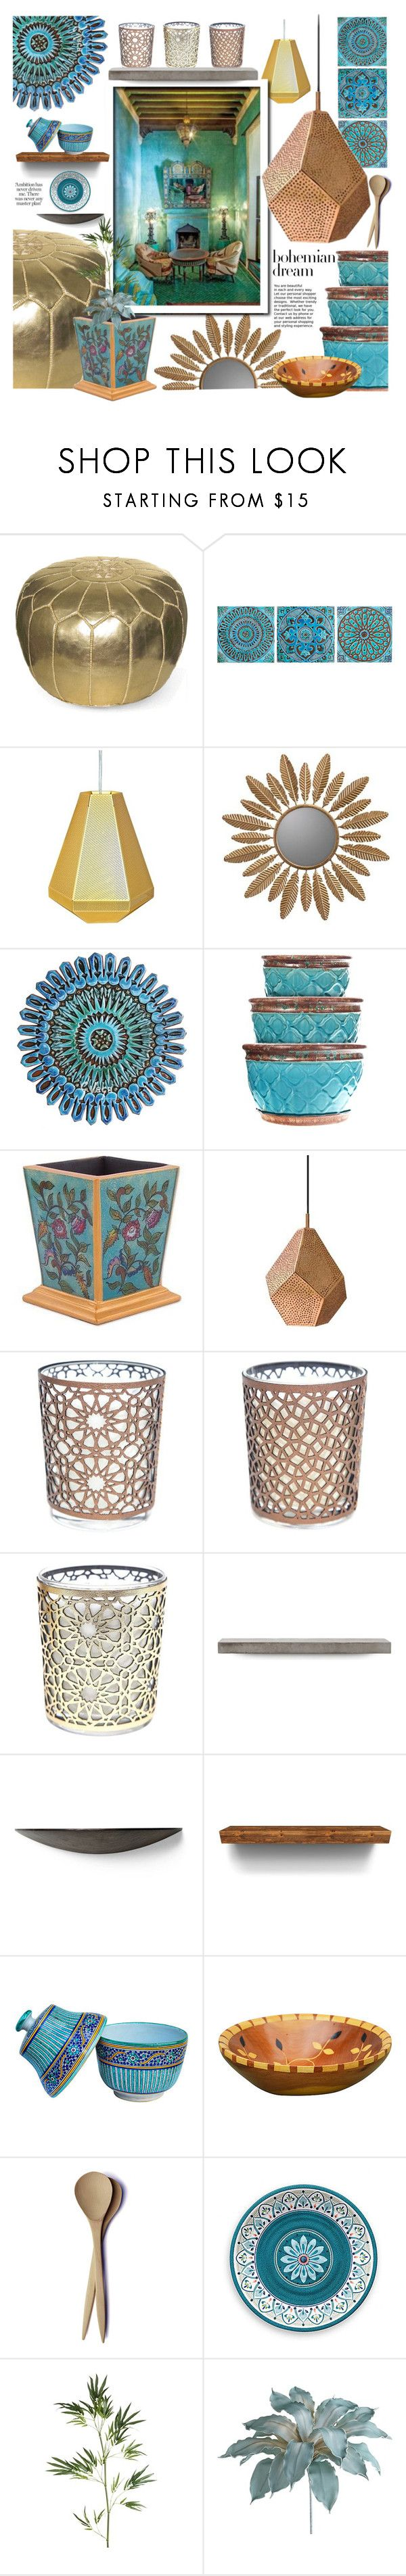 """Bohemian Dream: Moroccan Decor"" by ewa-naukowicz-wojcik ❤ liked on Polyvore featuring interior, interiors, interior design, home, home decor, interior decorating, Tom Dixon, Cooper Classics, NOVICA and Lyon Béton"